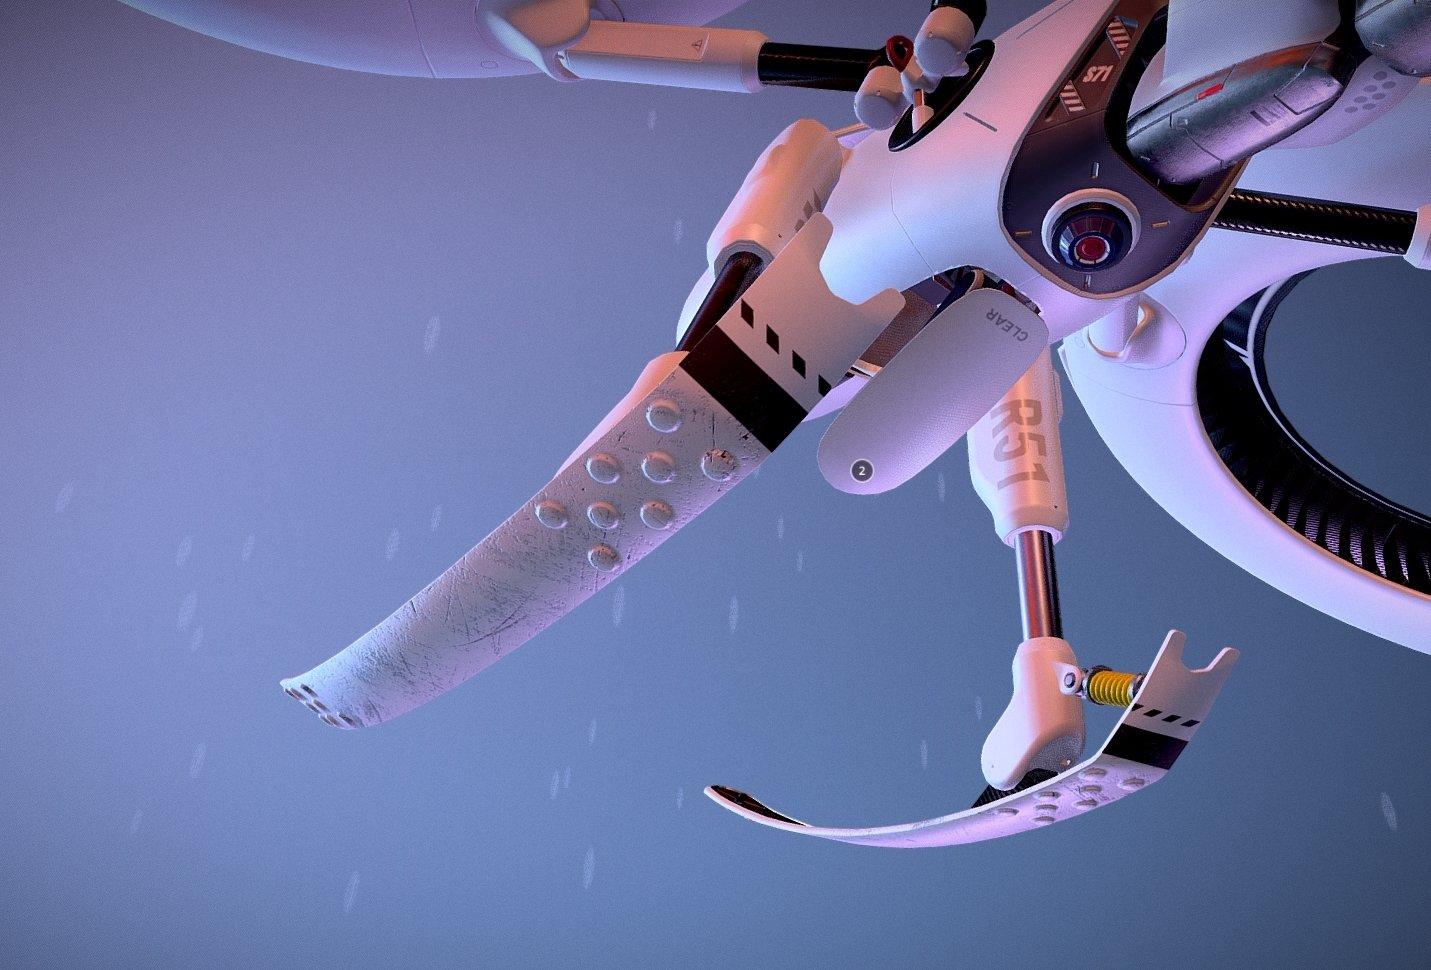 sci-fi drone texture details